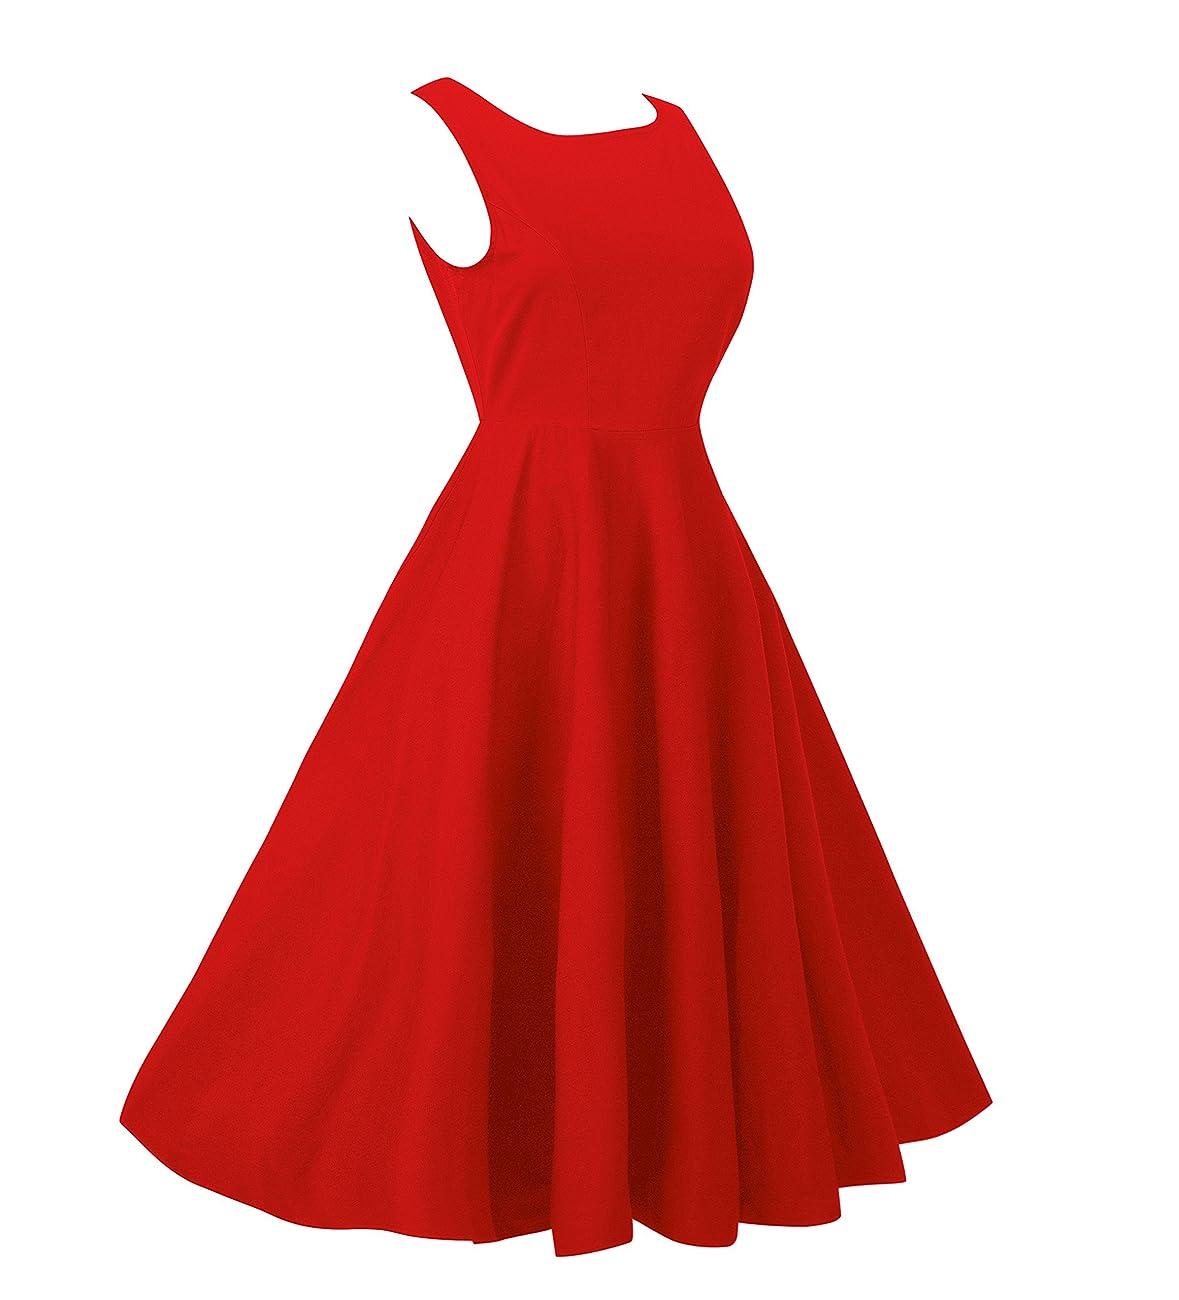 NINEWE Women's Classy Audrey Hepburn 1950s Vintage Rockabilly Swing Dress 1